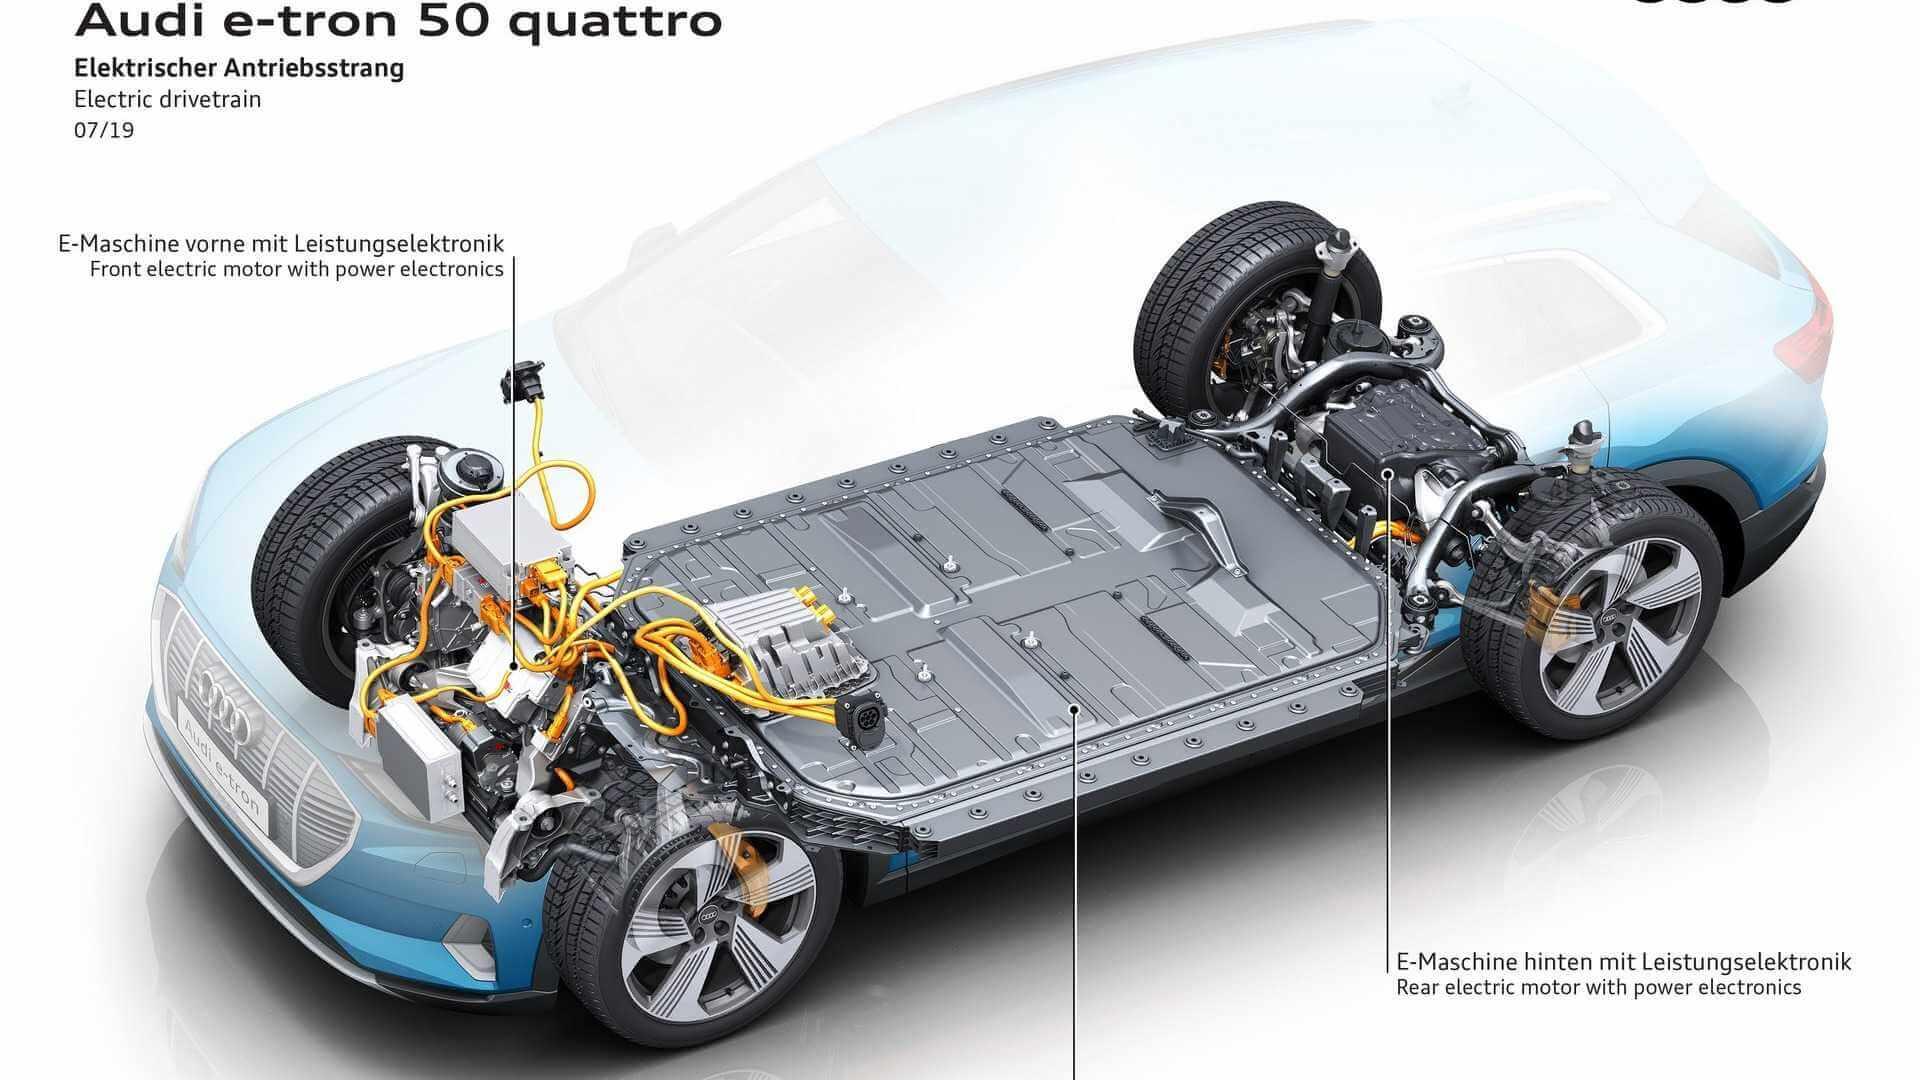 Электродвигатели Audi e-tron 50 quattro